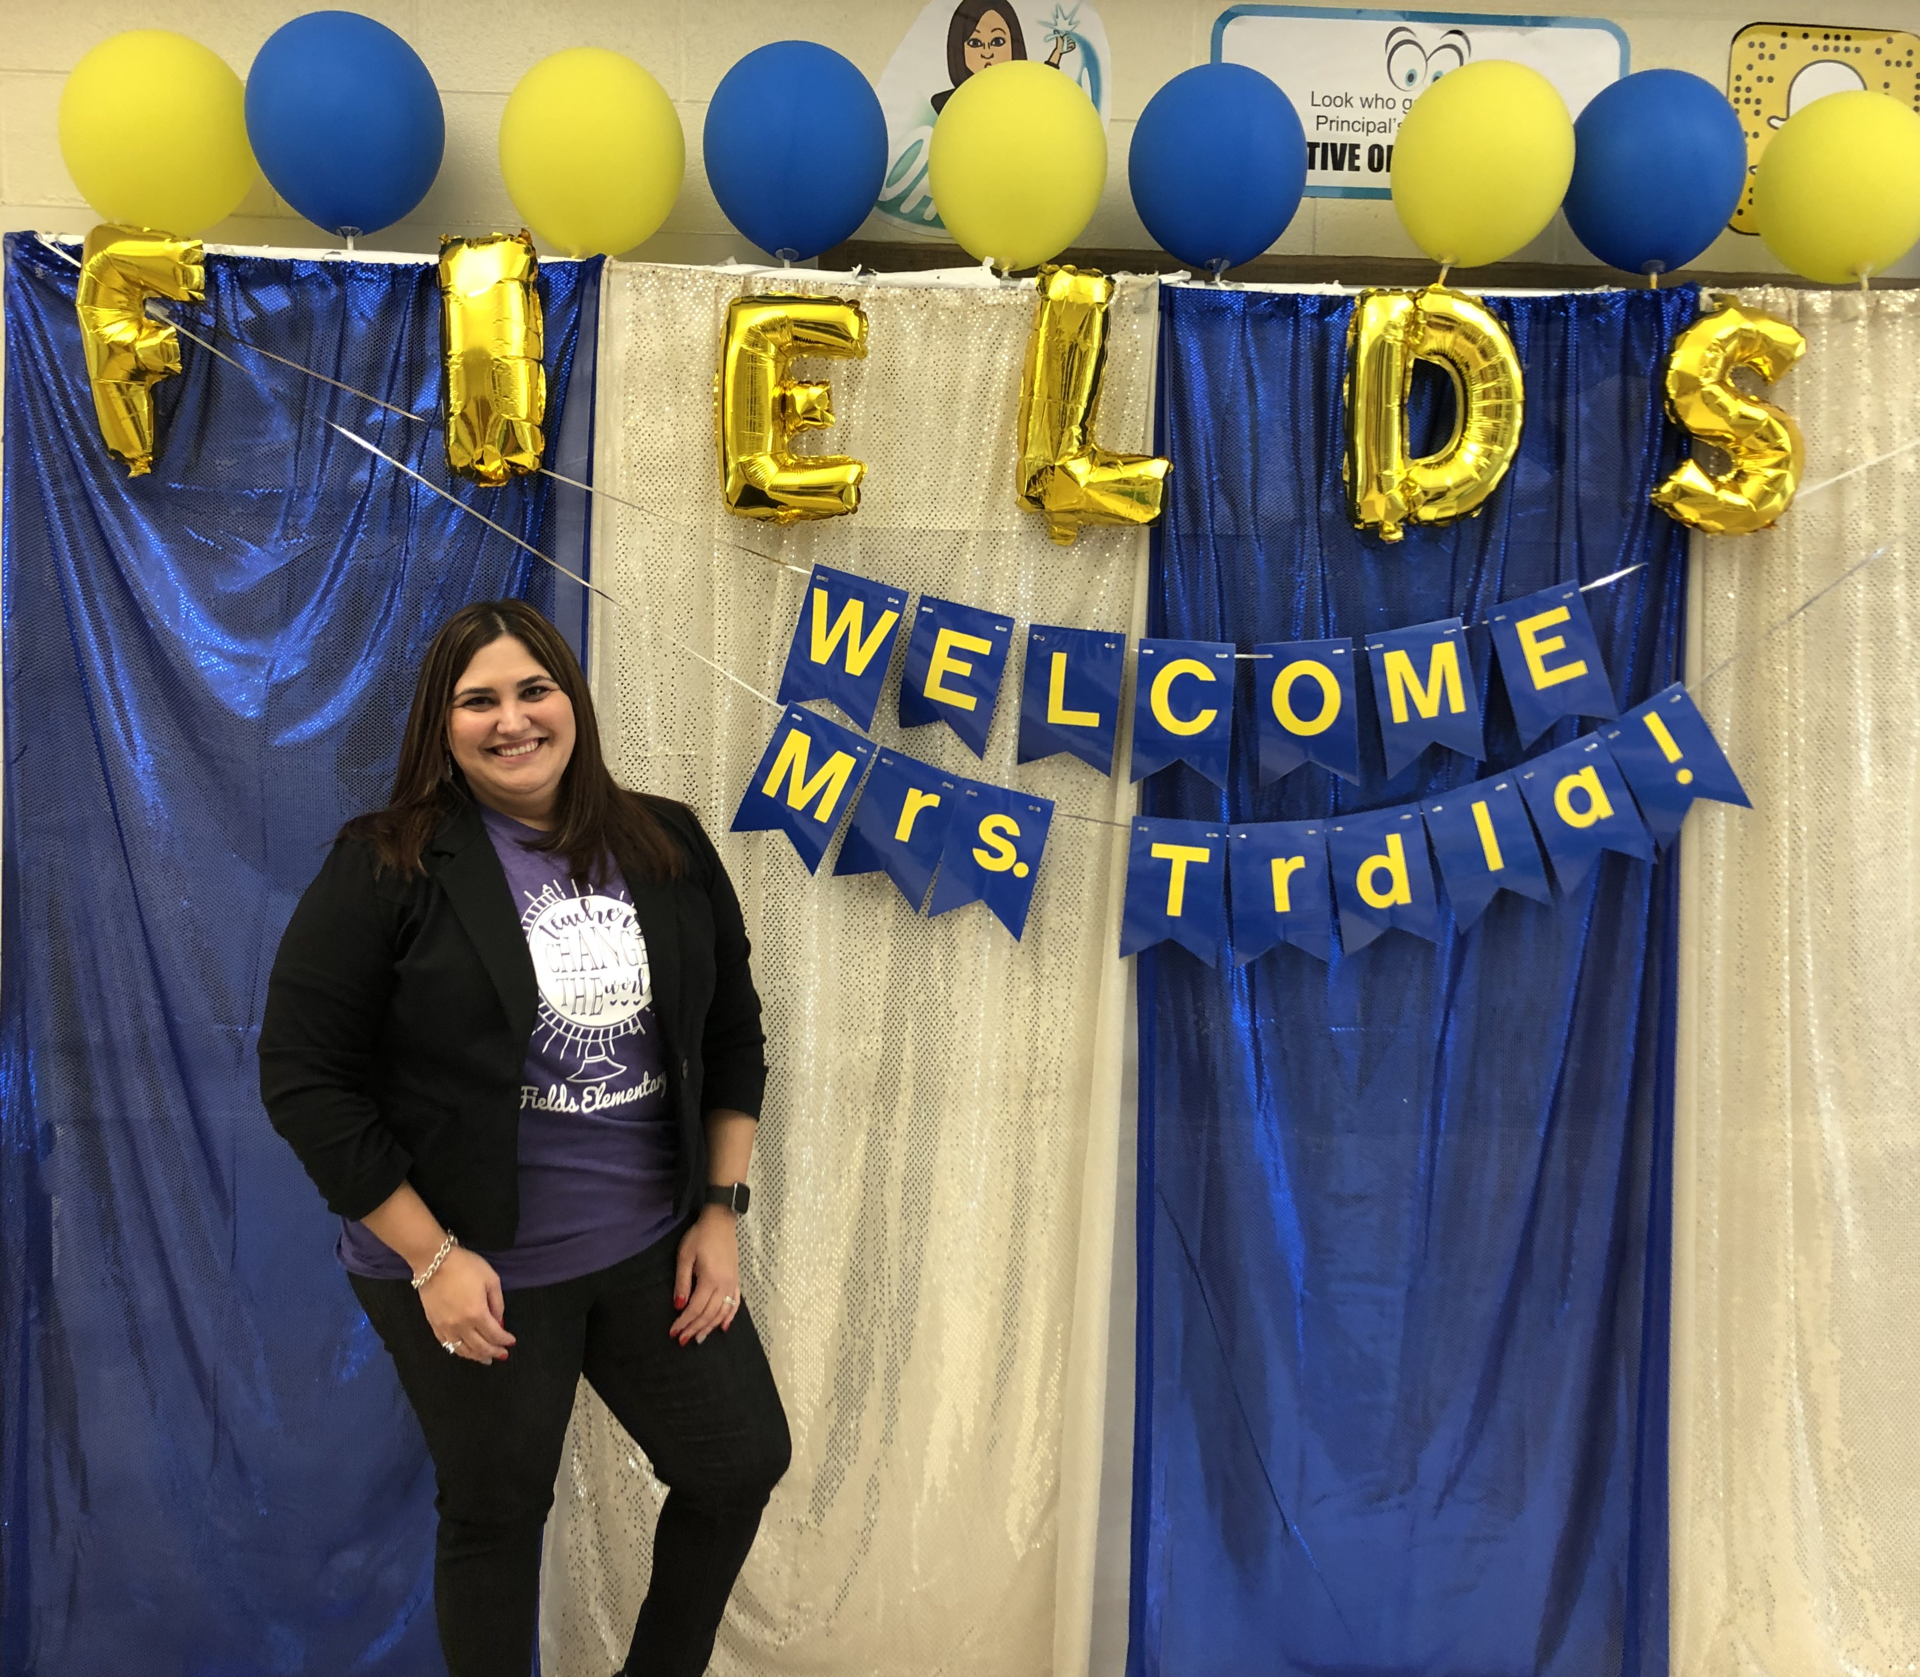 Mrs. Trdla - Principal